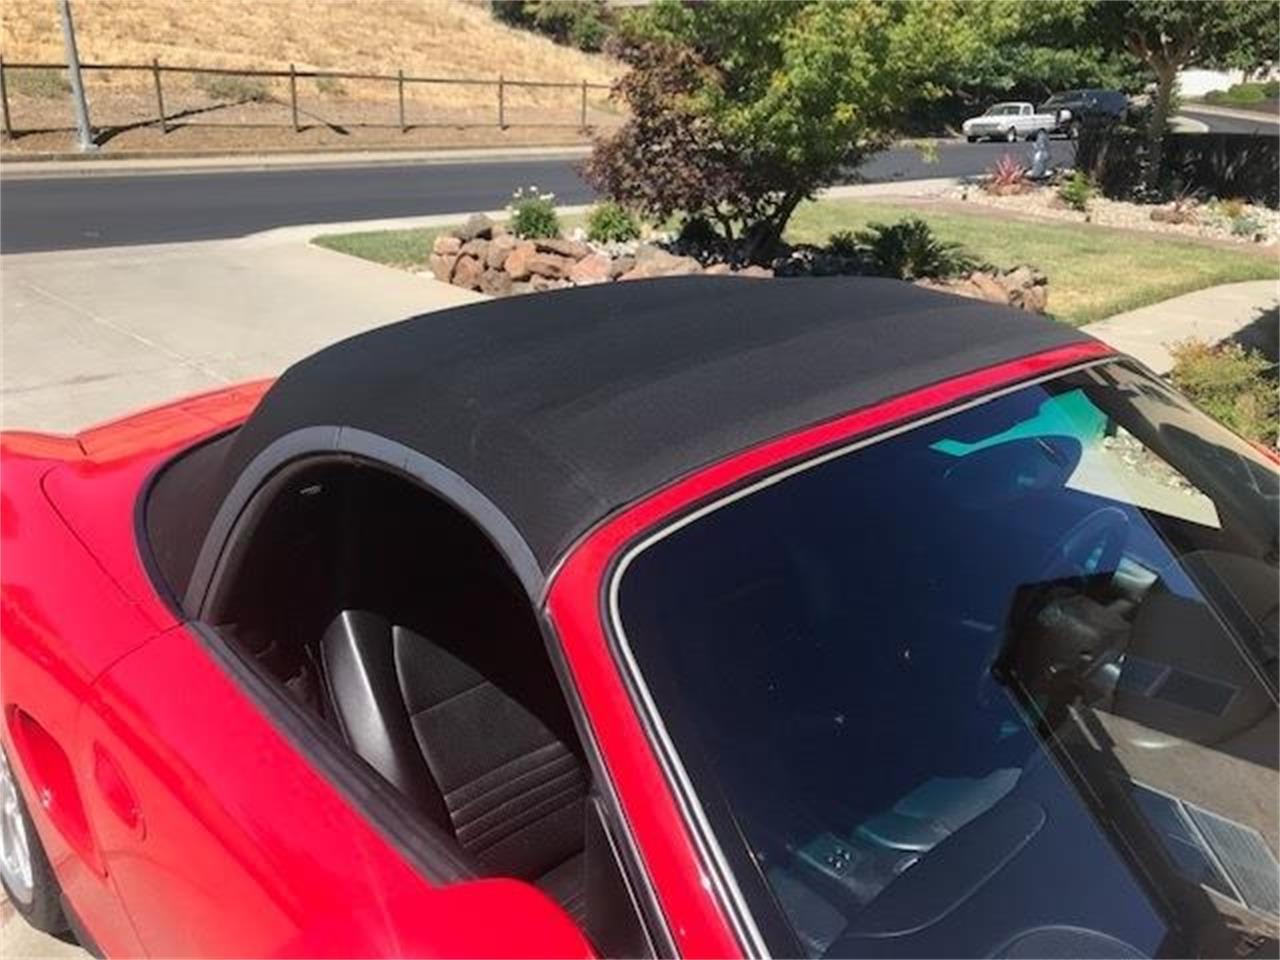 2000 Porsche Boxster (CC-1365984) for sale in Vacaville, California